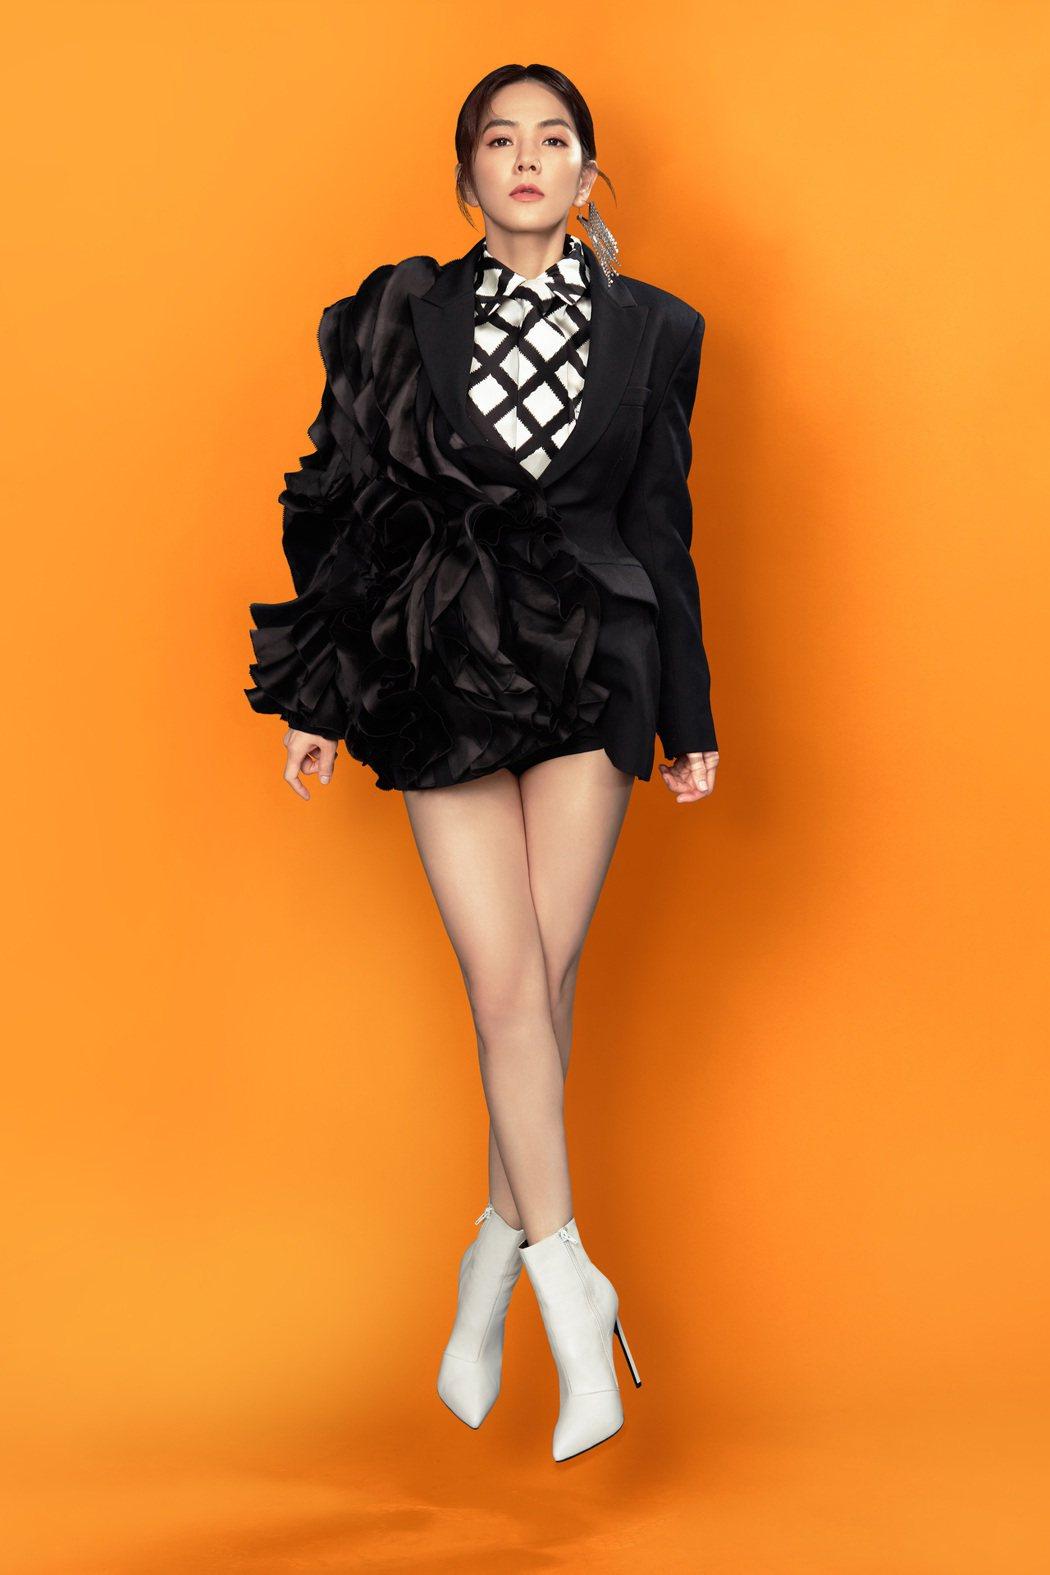 Ella飆唱新歌「娛樂無限公司」,挑戰人生最高音。圖/勁樺娛樂提供